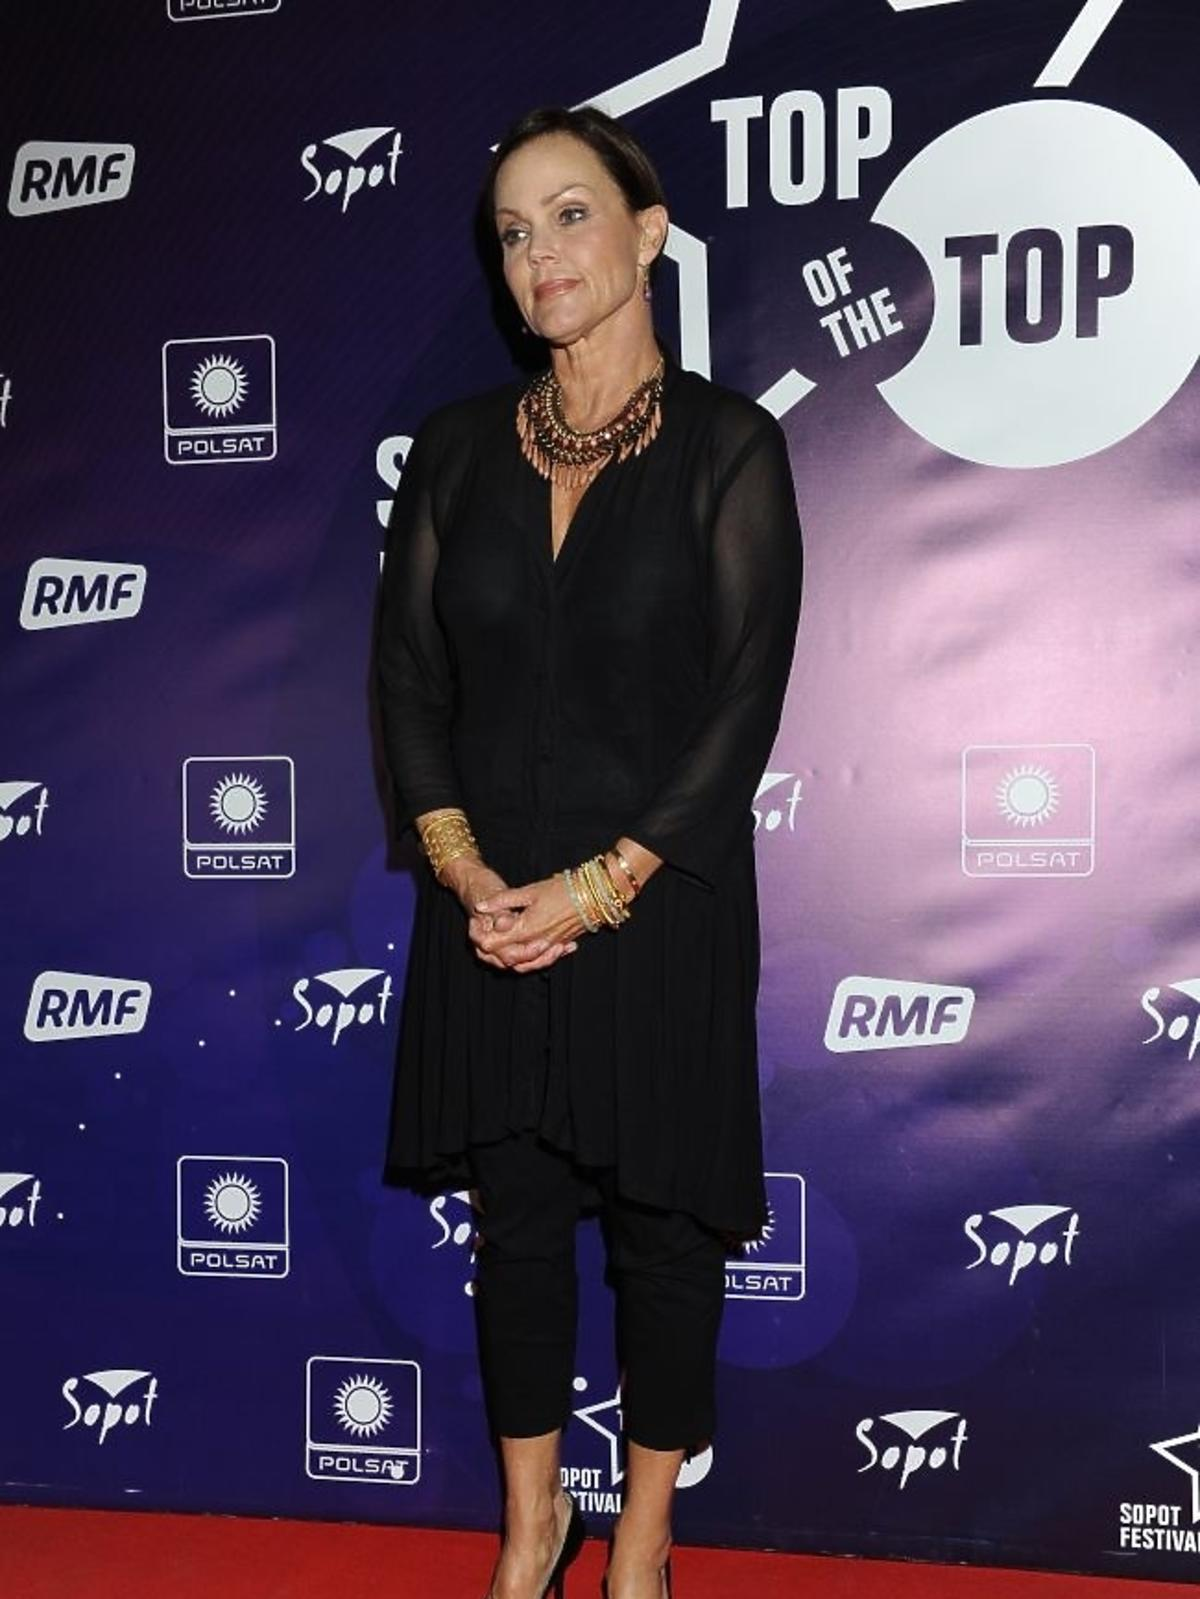 Belinda Carlisle podczas pierwszego dnia Sopot Top of the Top Festival 2013